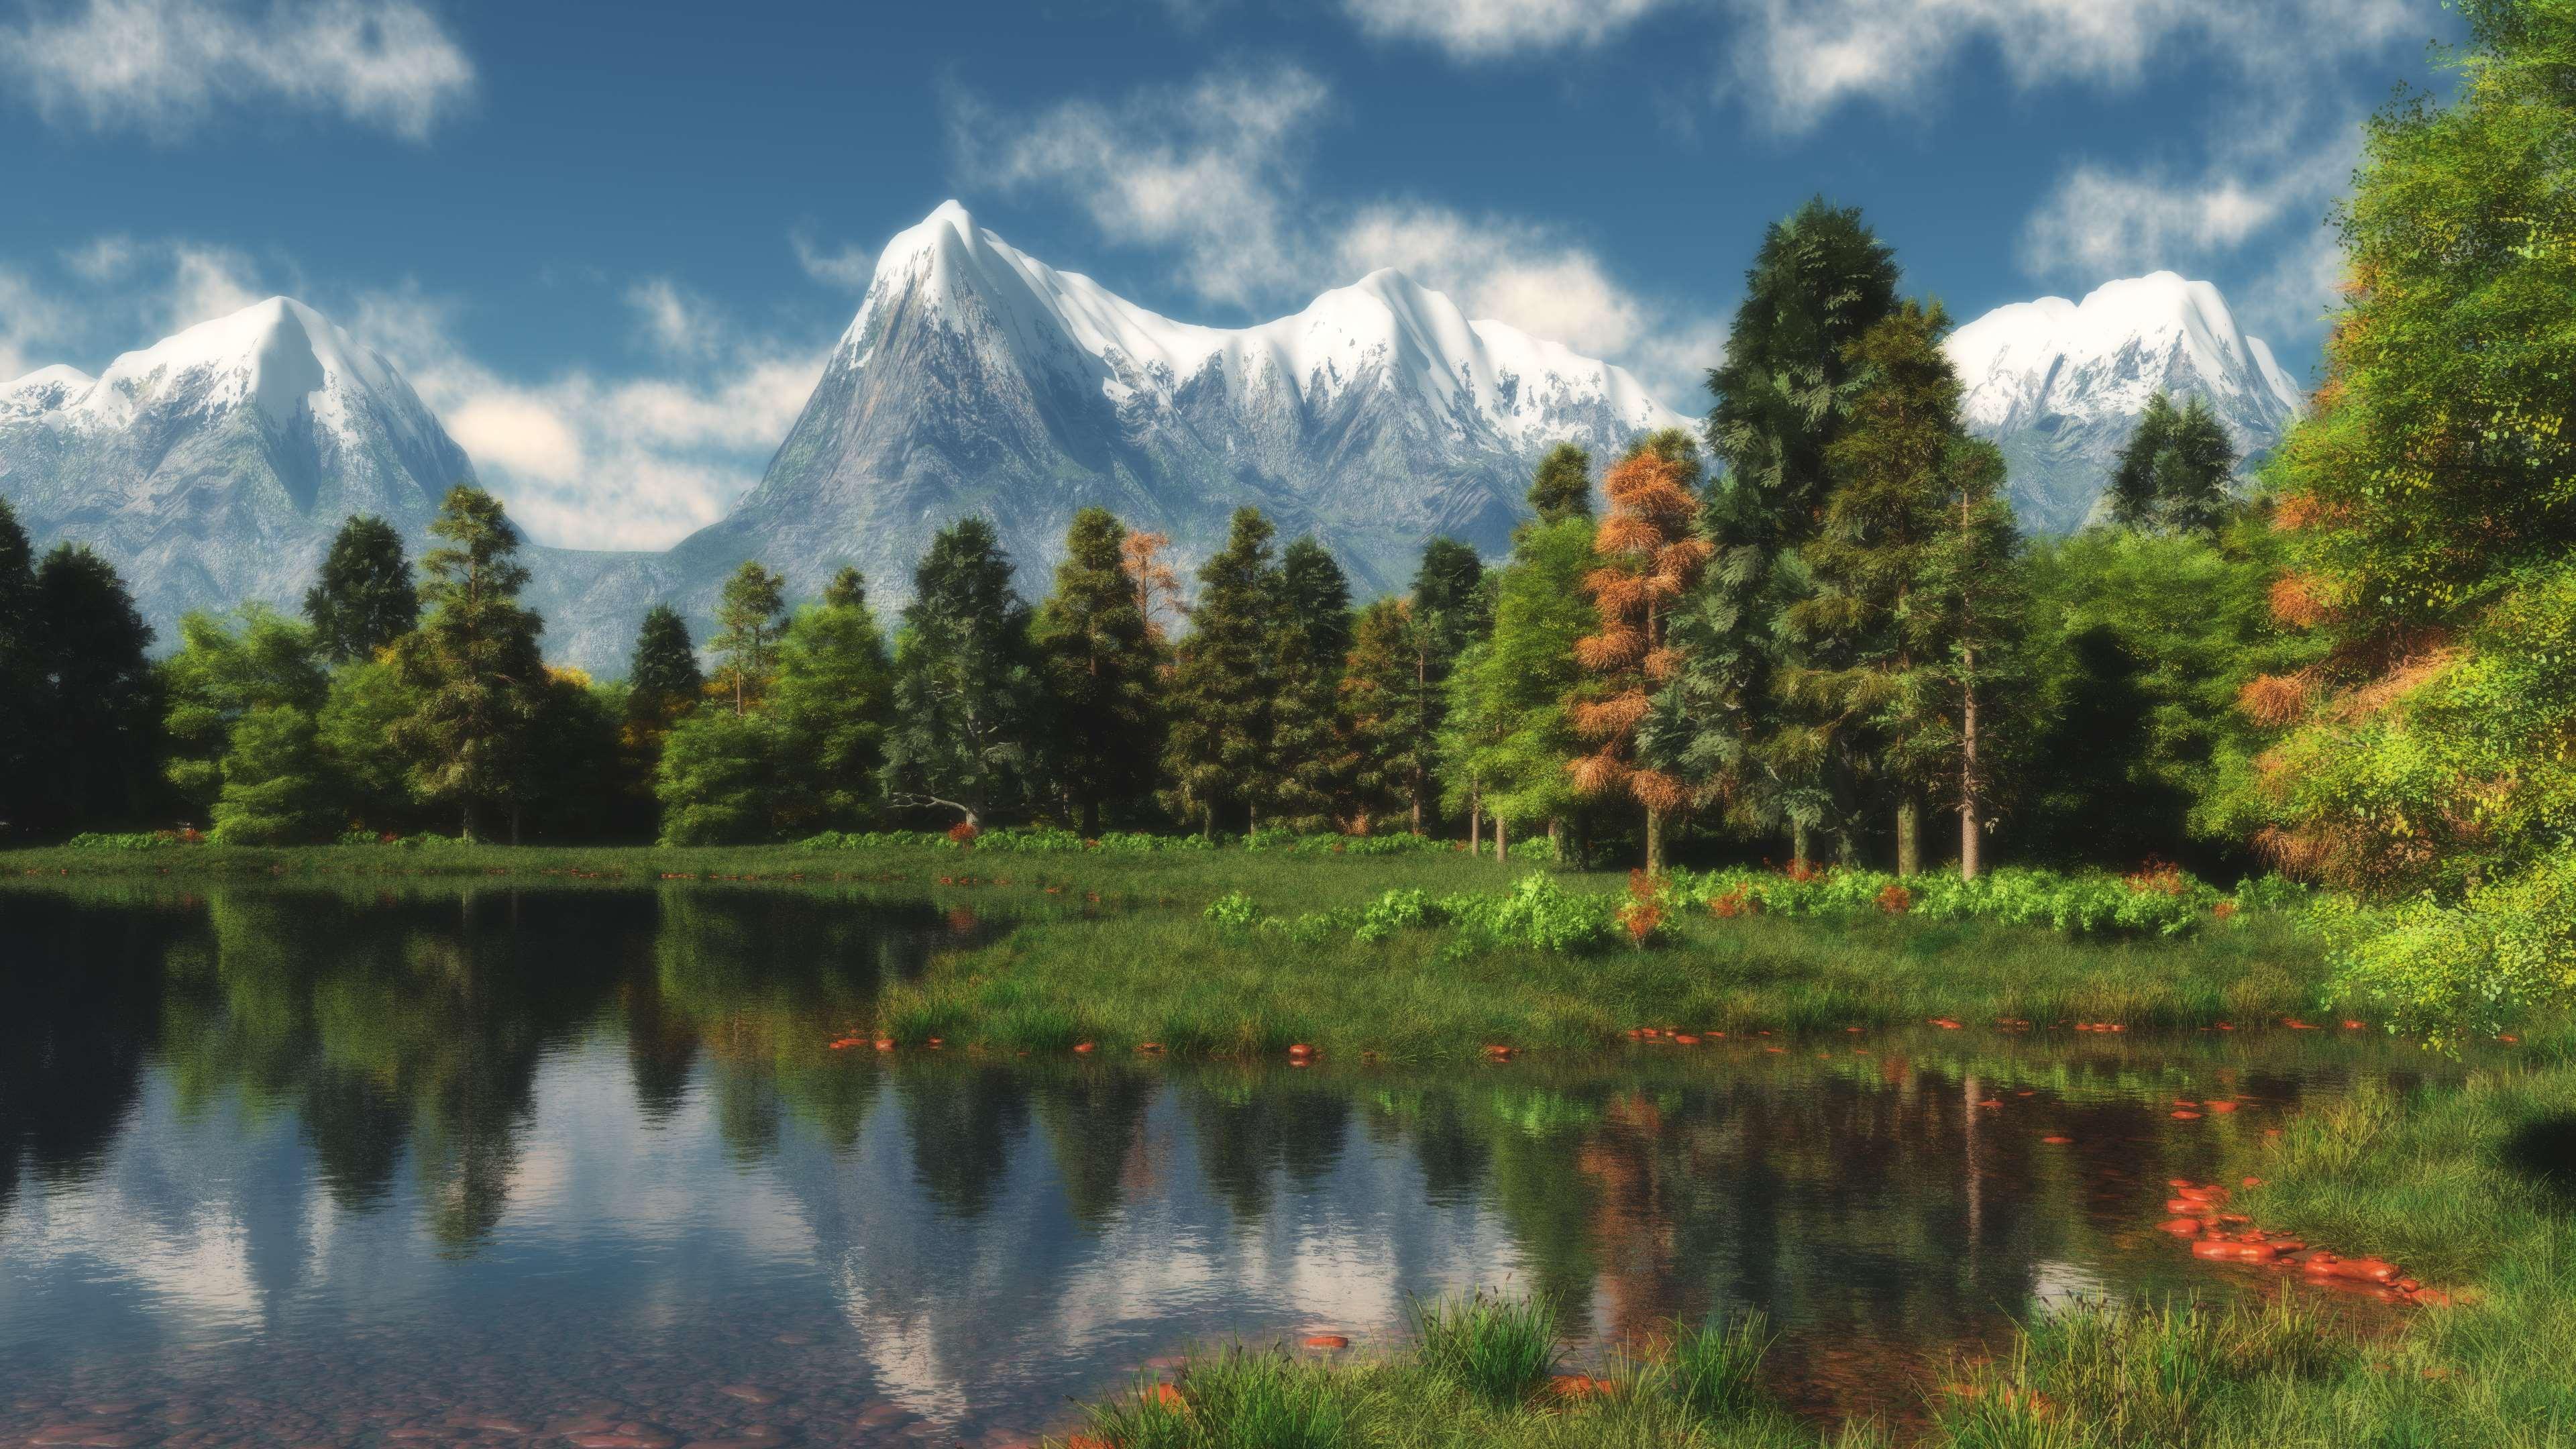 Обои - Mountain Photo Landscapes [3840x2160] [50 шт.] (2018) JPG